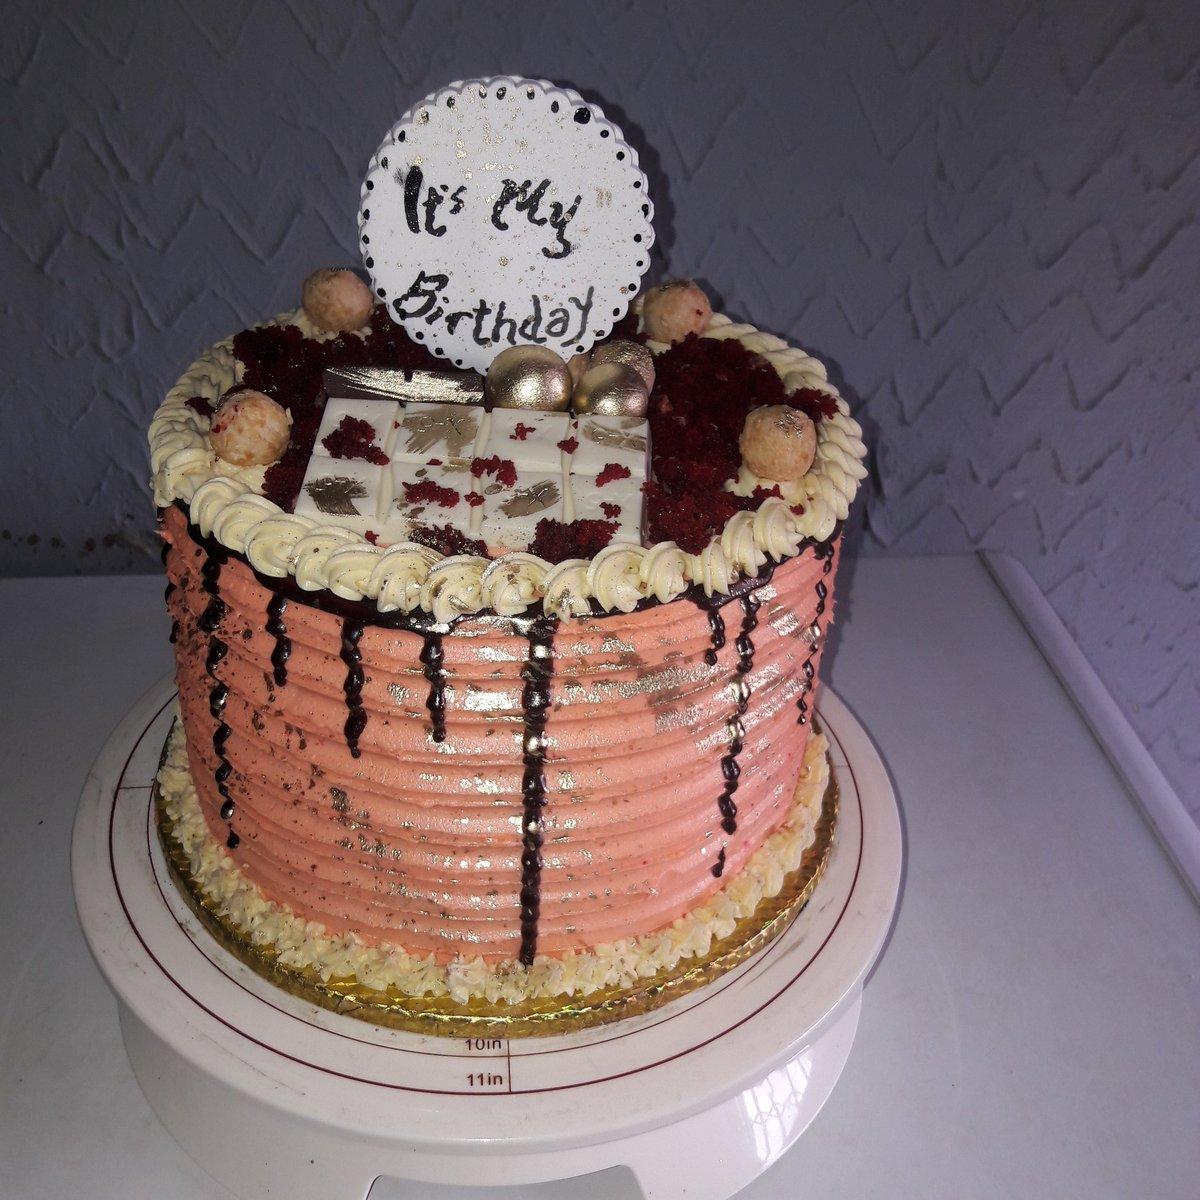 cake by me For me . I ain't jobless . I am a self made entrepreneur HBD to me  #TachaLeads #December9 #ProudlySagittarrus<br>http://pic.twitter.com/YOZ2kXmtPx